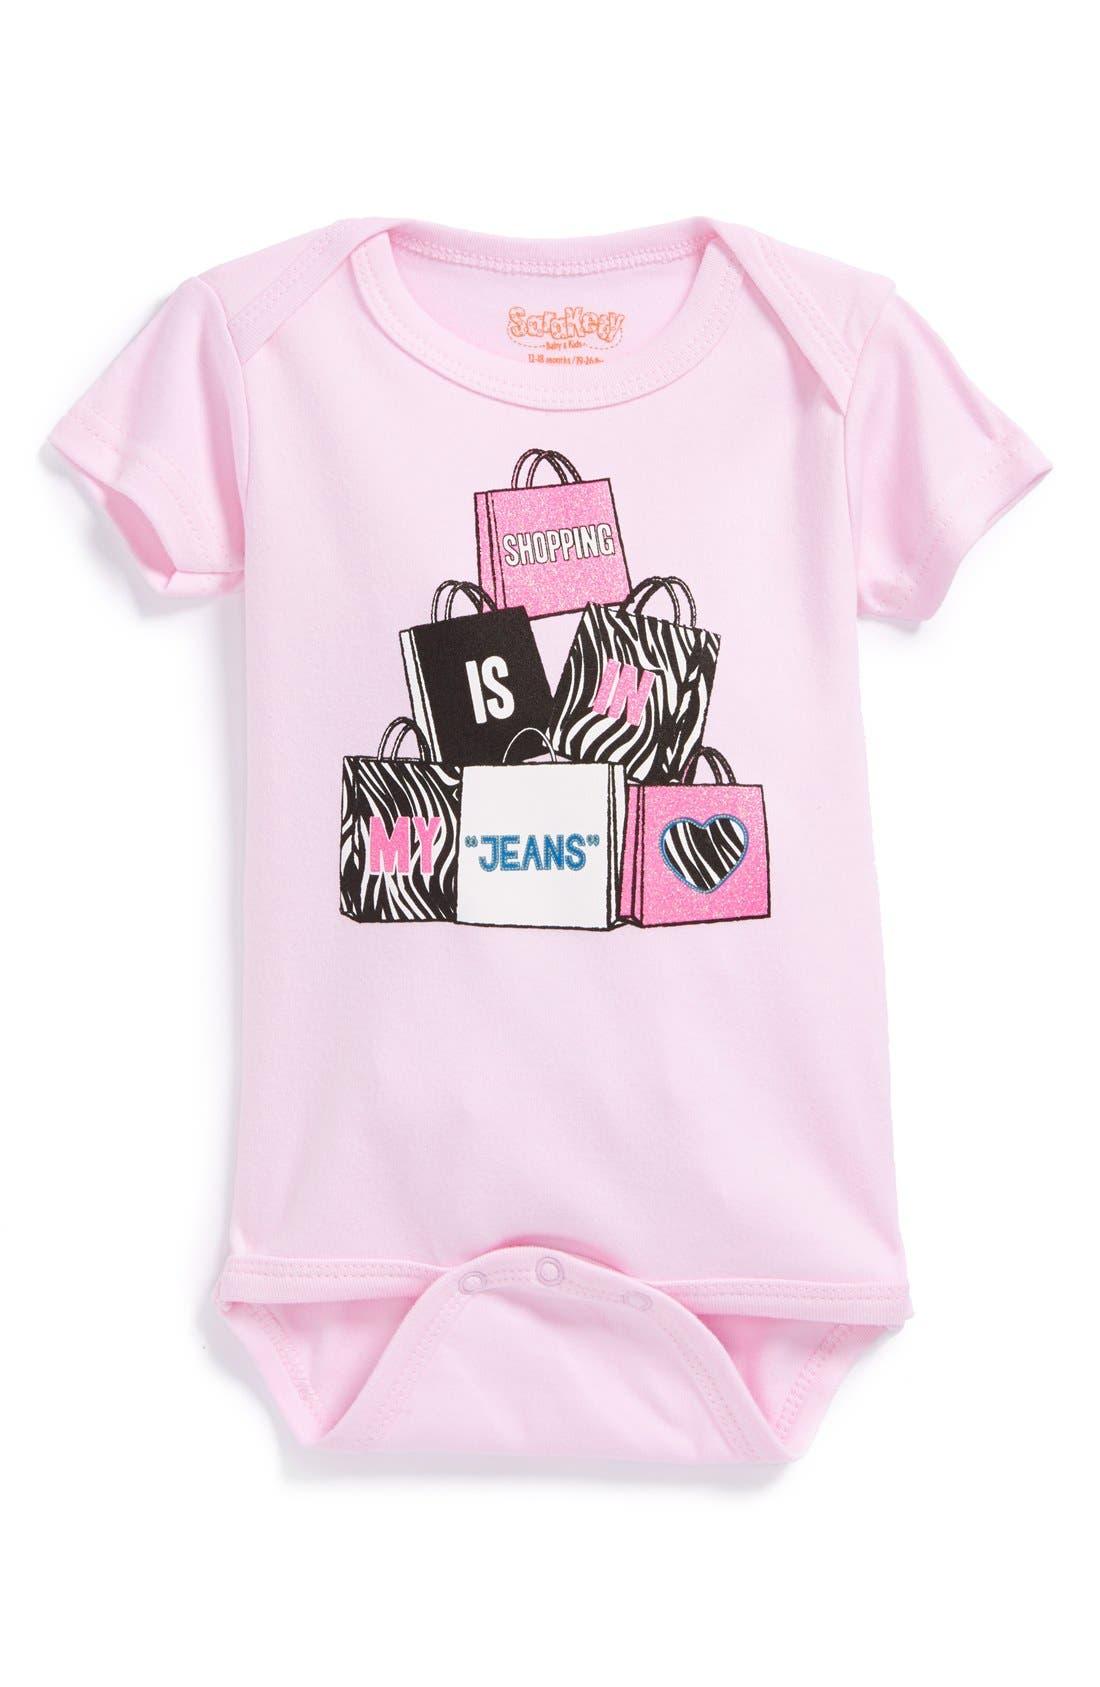 Main Image - Sara Kety Baby & Kids 'Shopping Jeans' Short Sleeve Bodysuit (Baby Girls)